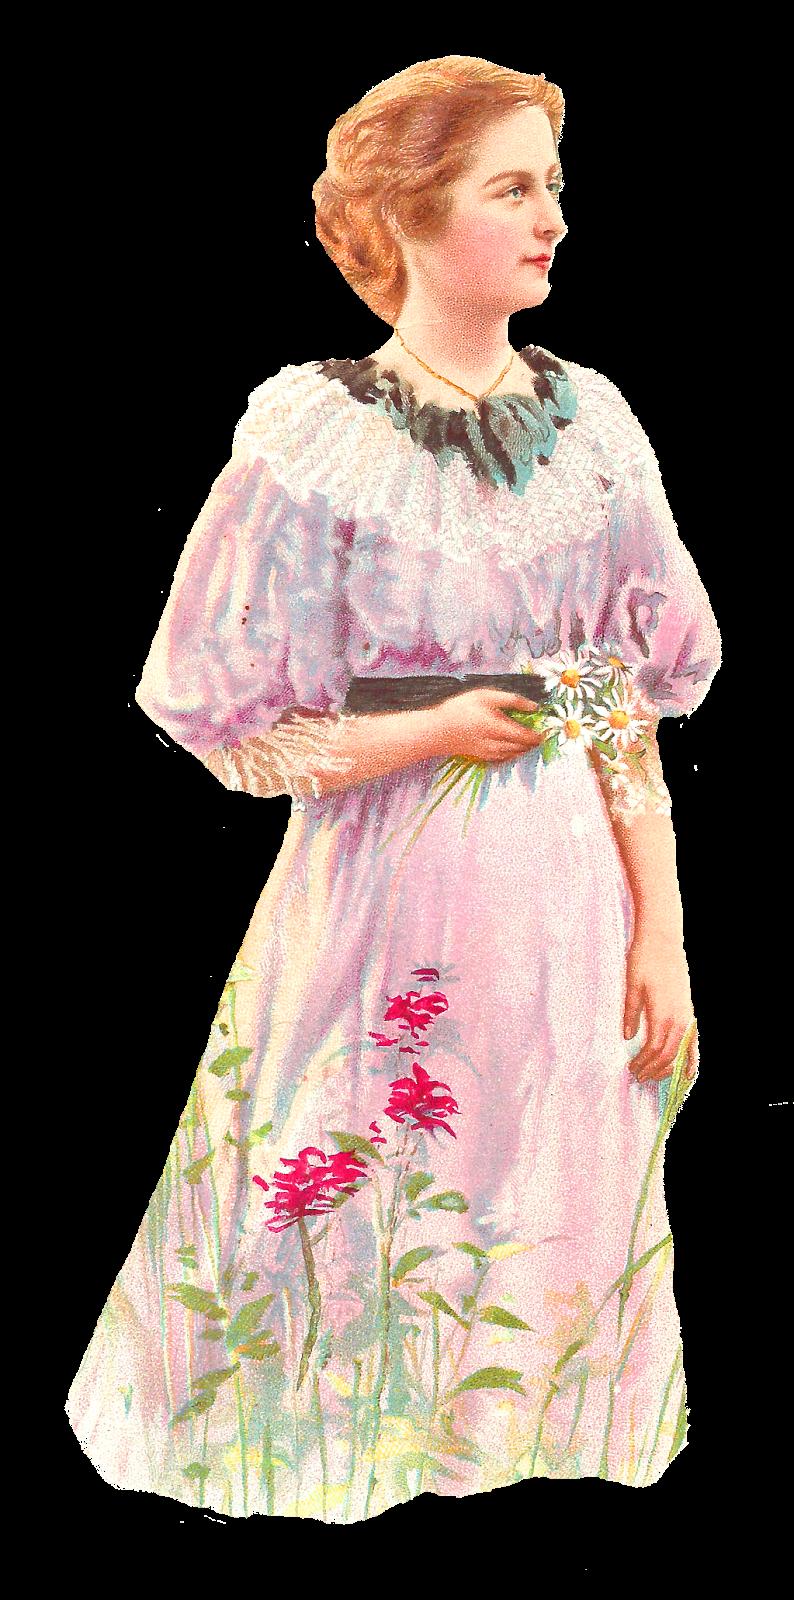 Antique images vintage woman. Daisies clipart spring season